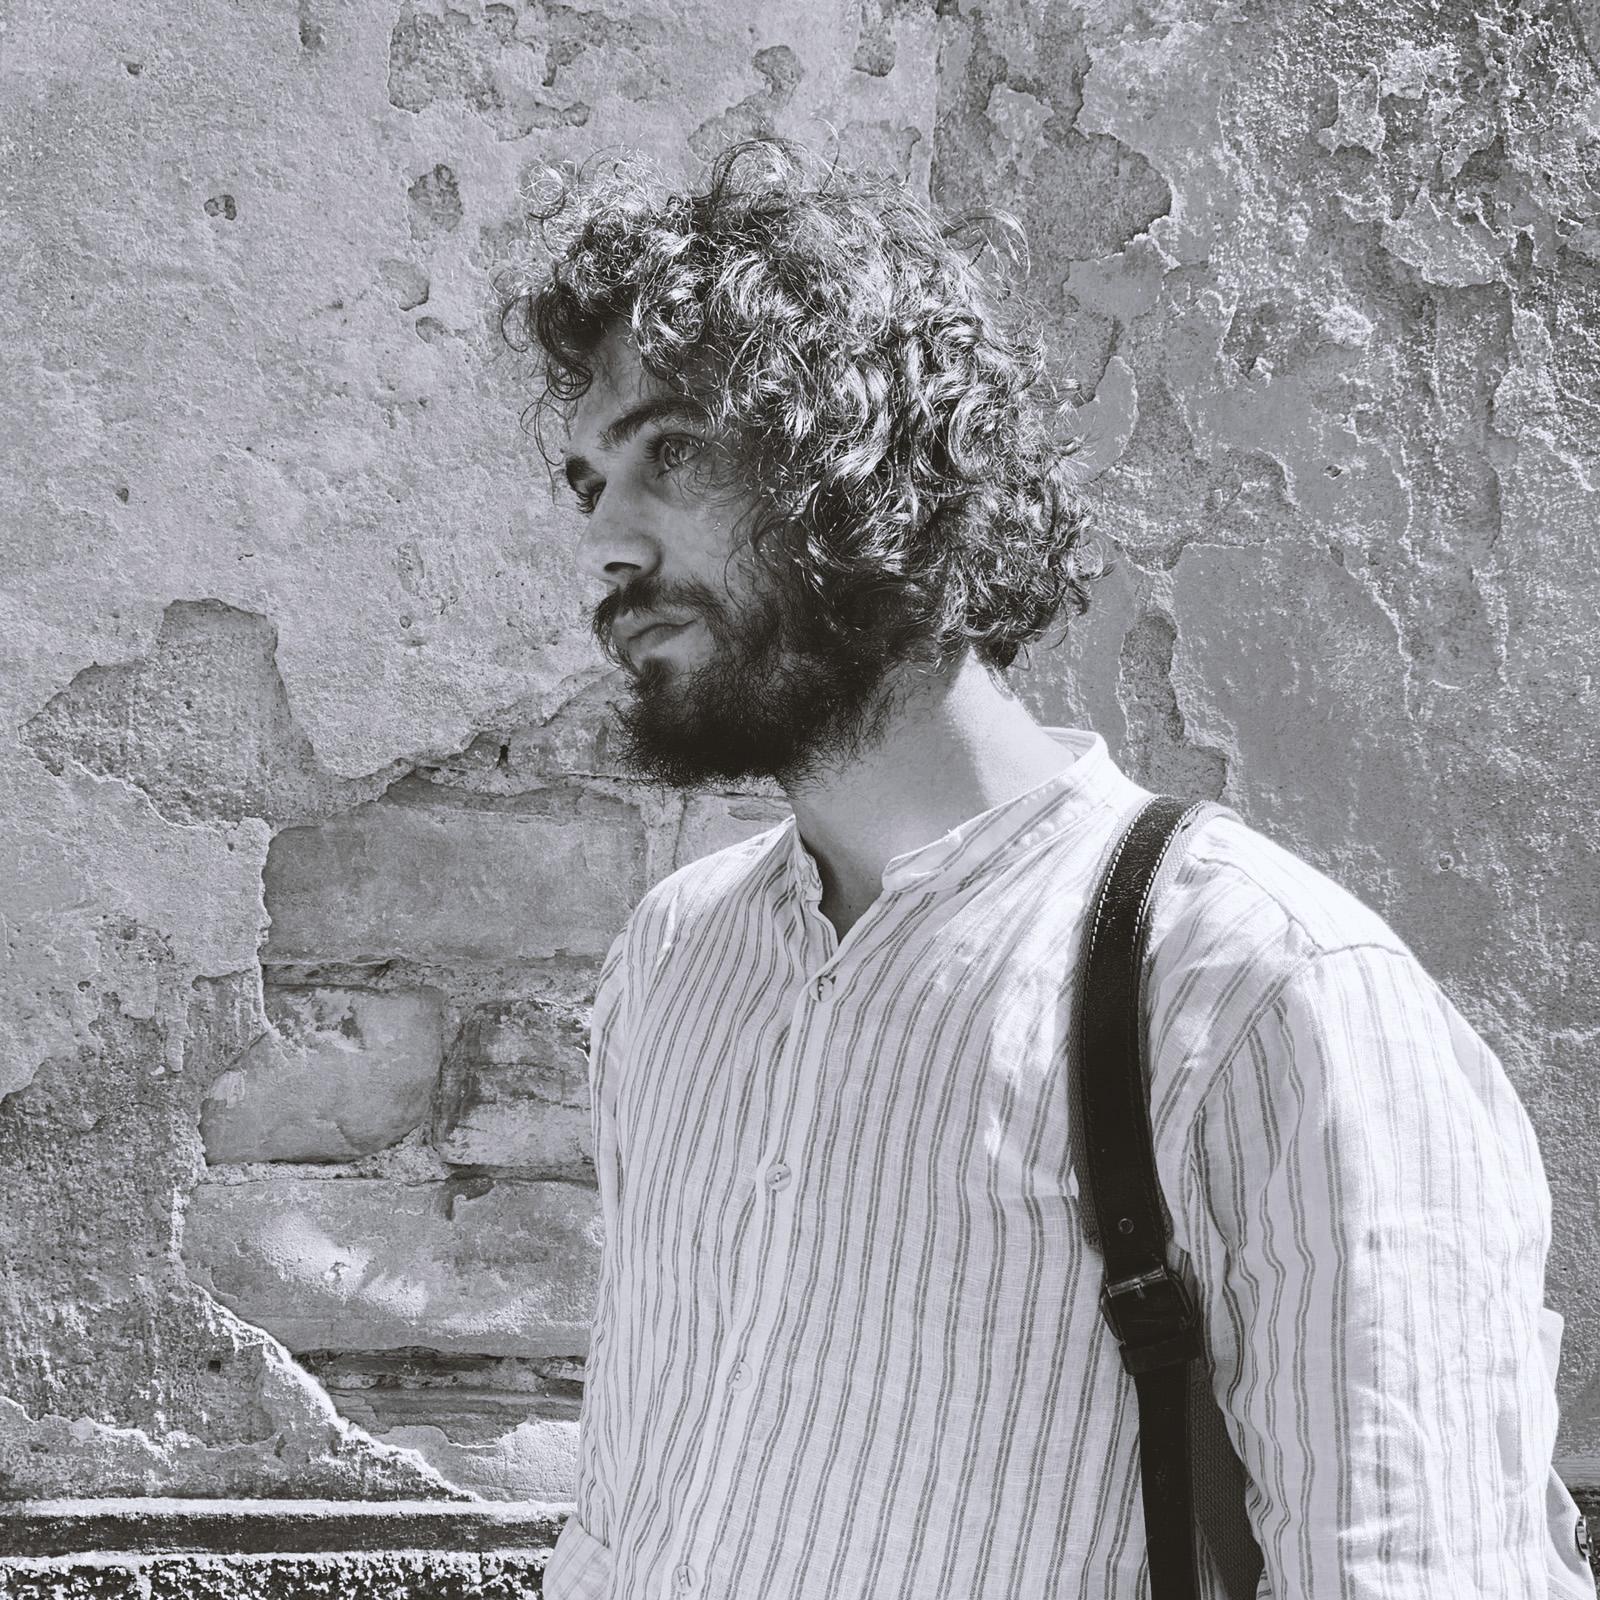 Marco Leoni